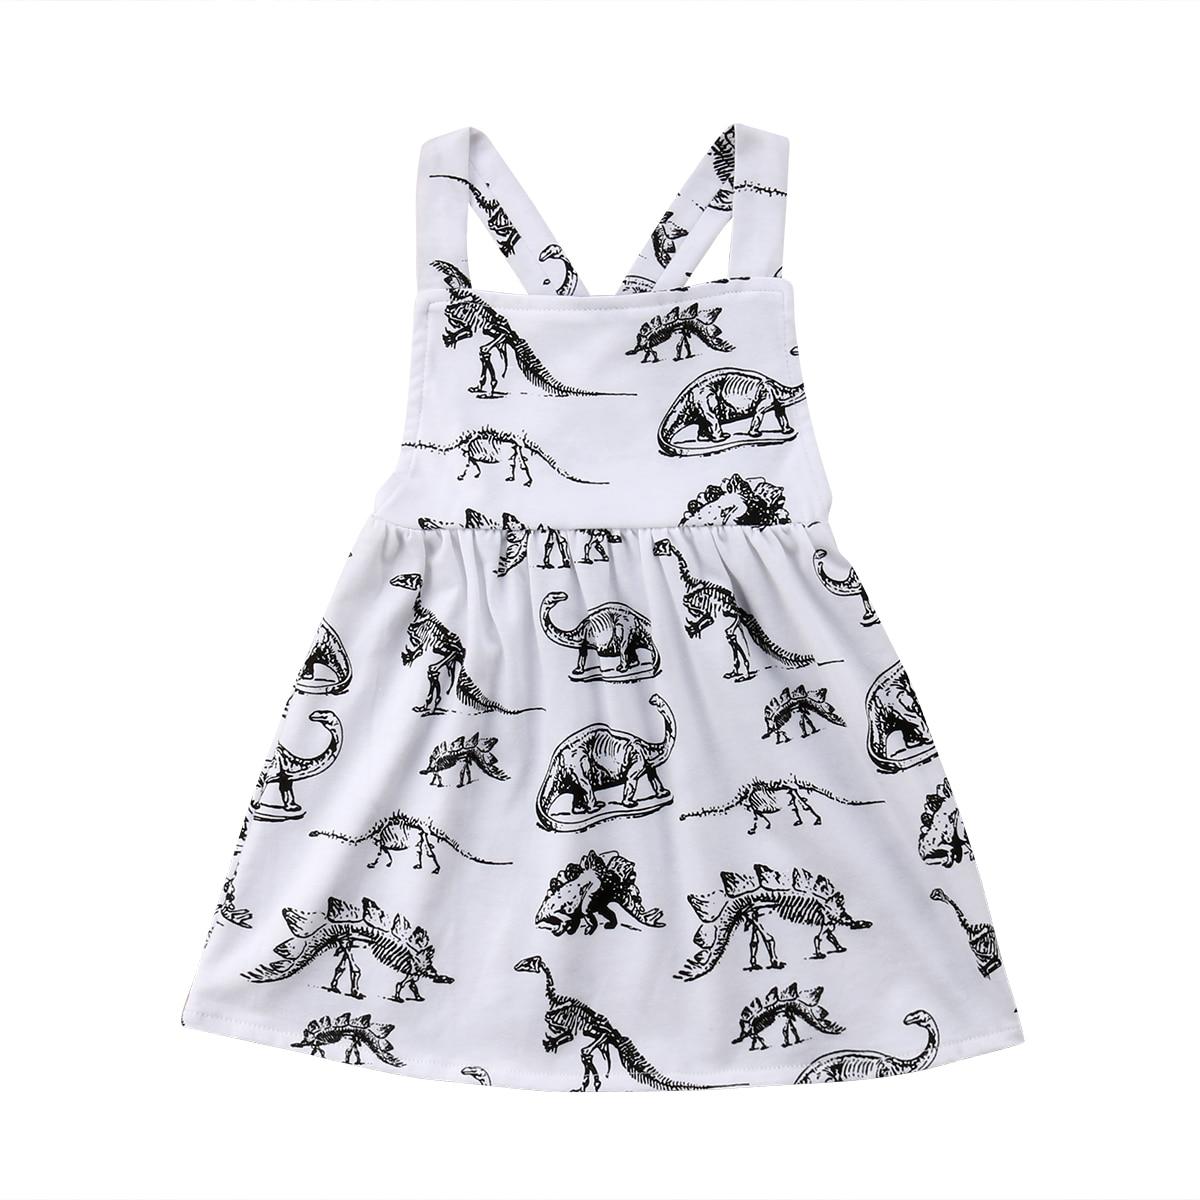 Dinosaur Print Newborn Kids Baby Girls Cotton Sleeveless Dress Sundress Baby Girls Summer Clothes